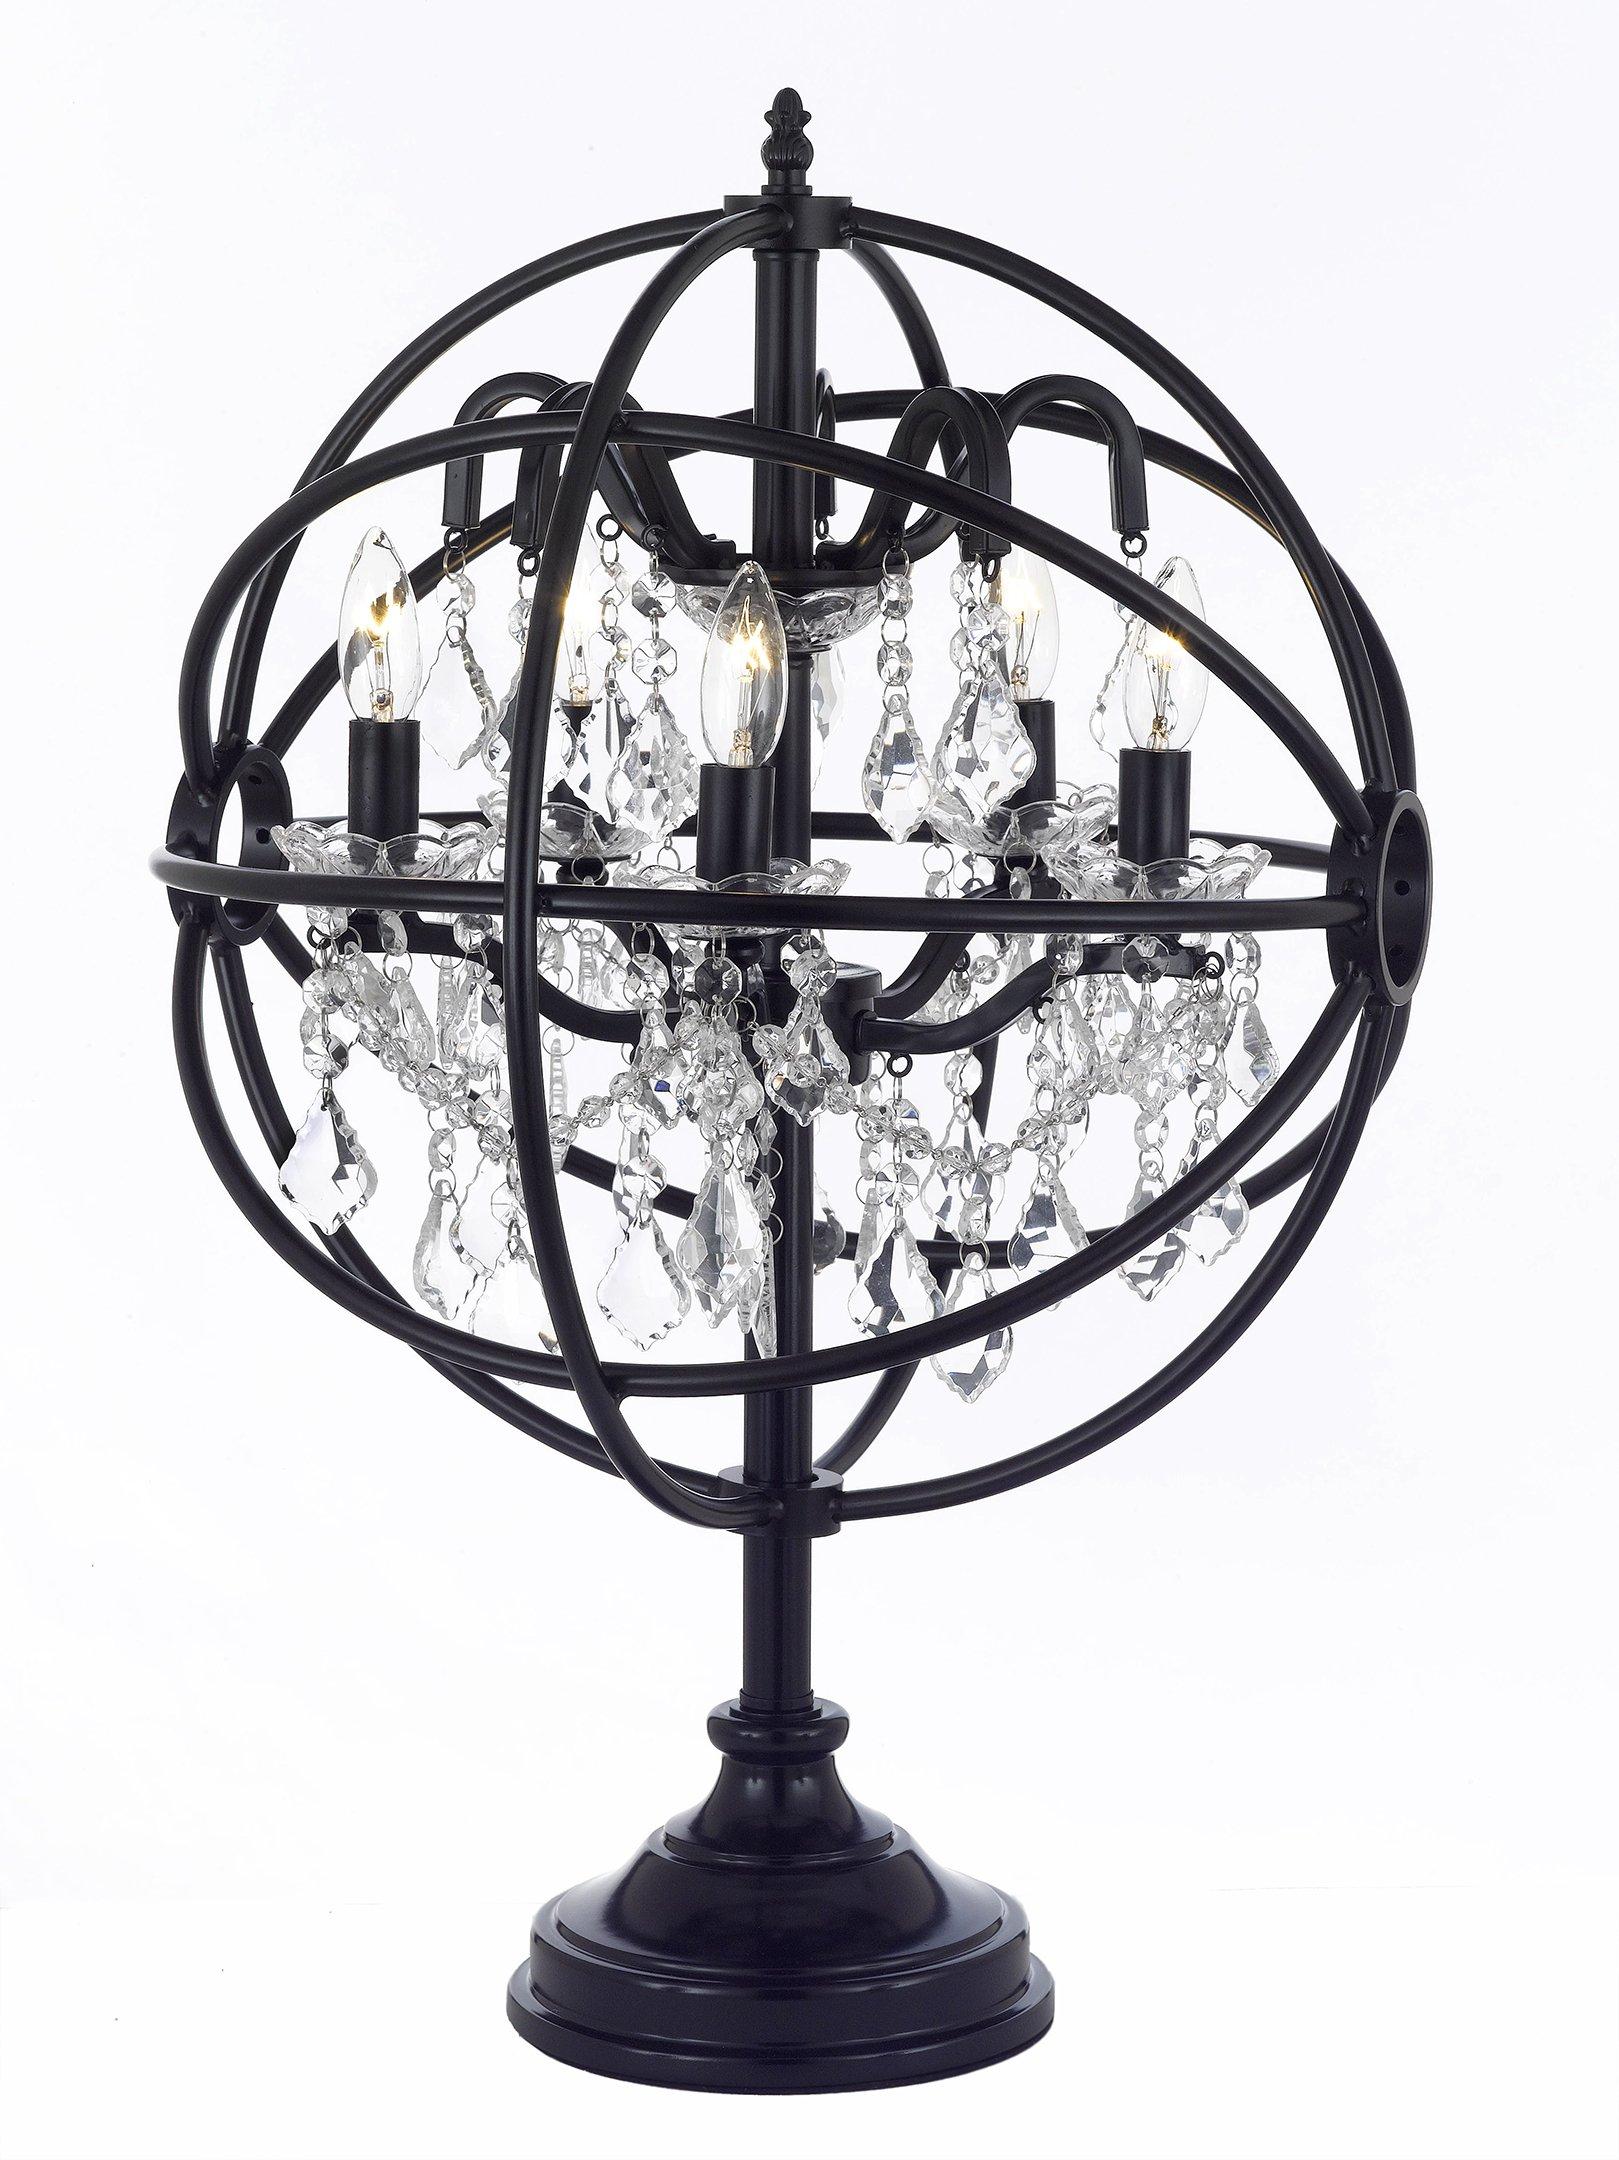 Foucault's Orb Crystal Iron 5 Light Table Lamp Modern Contemporary Lamp by Dean